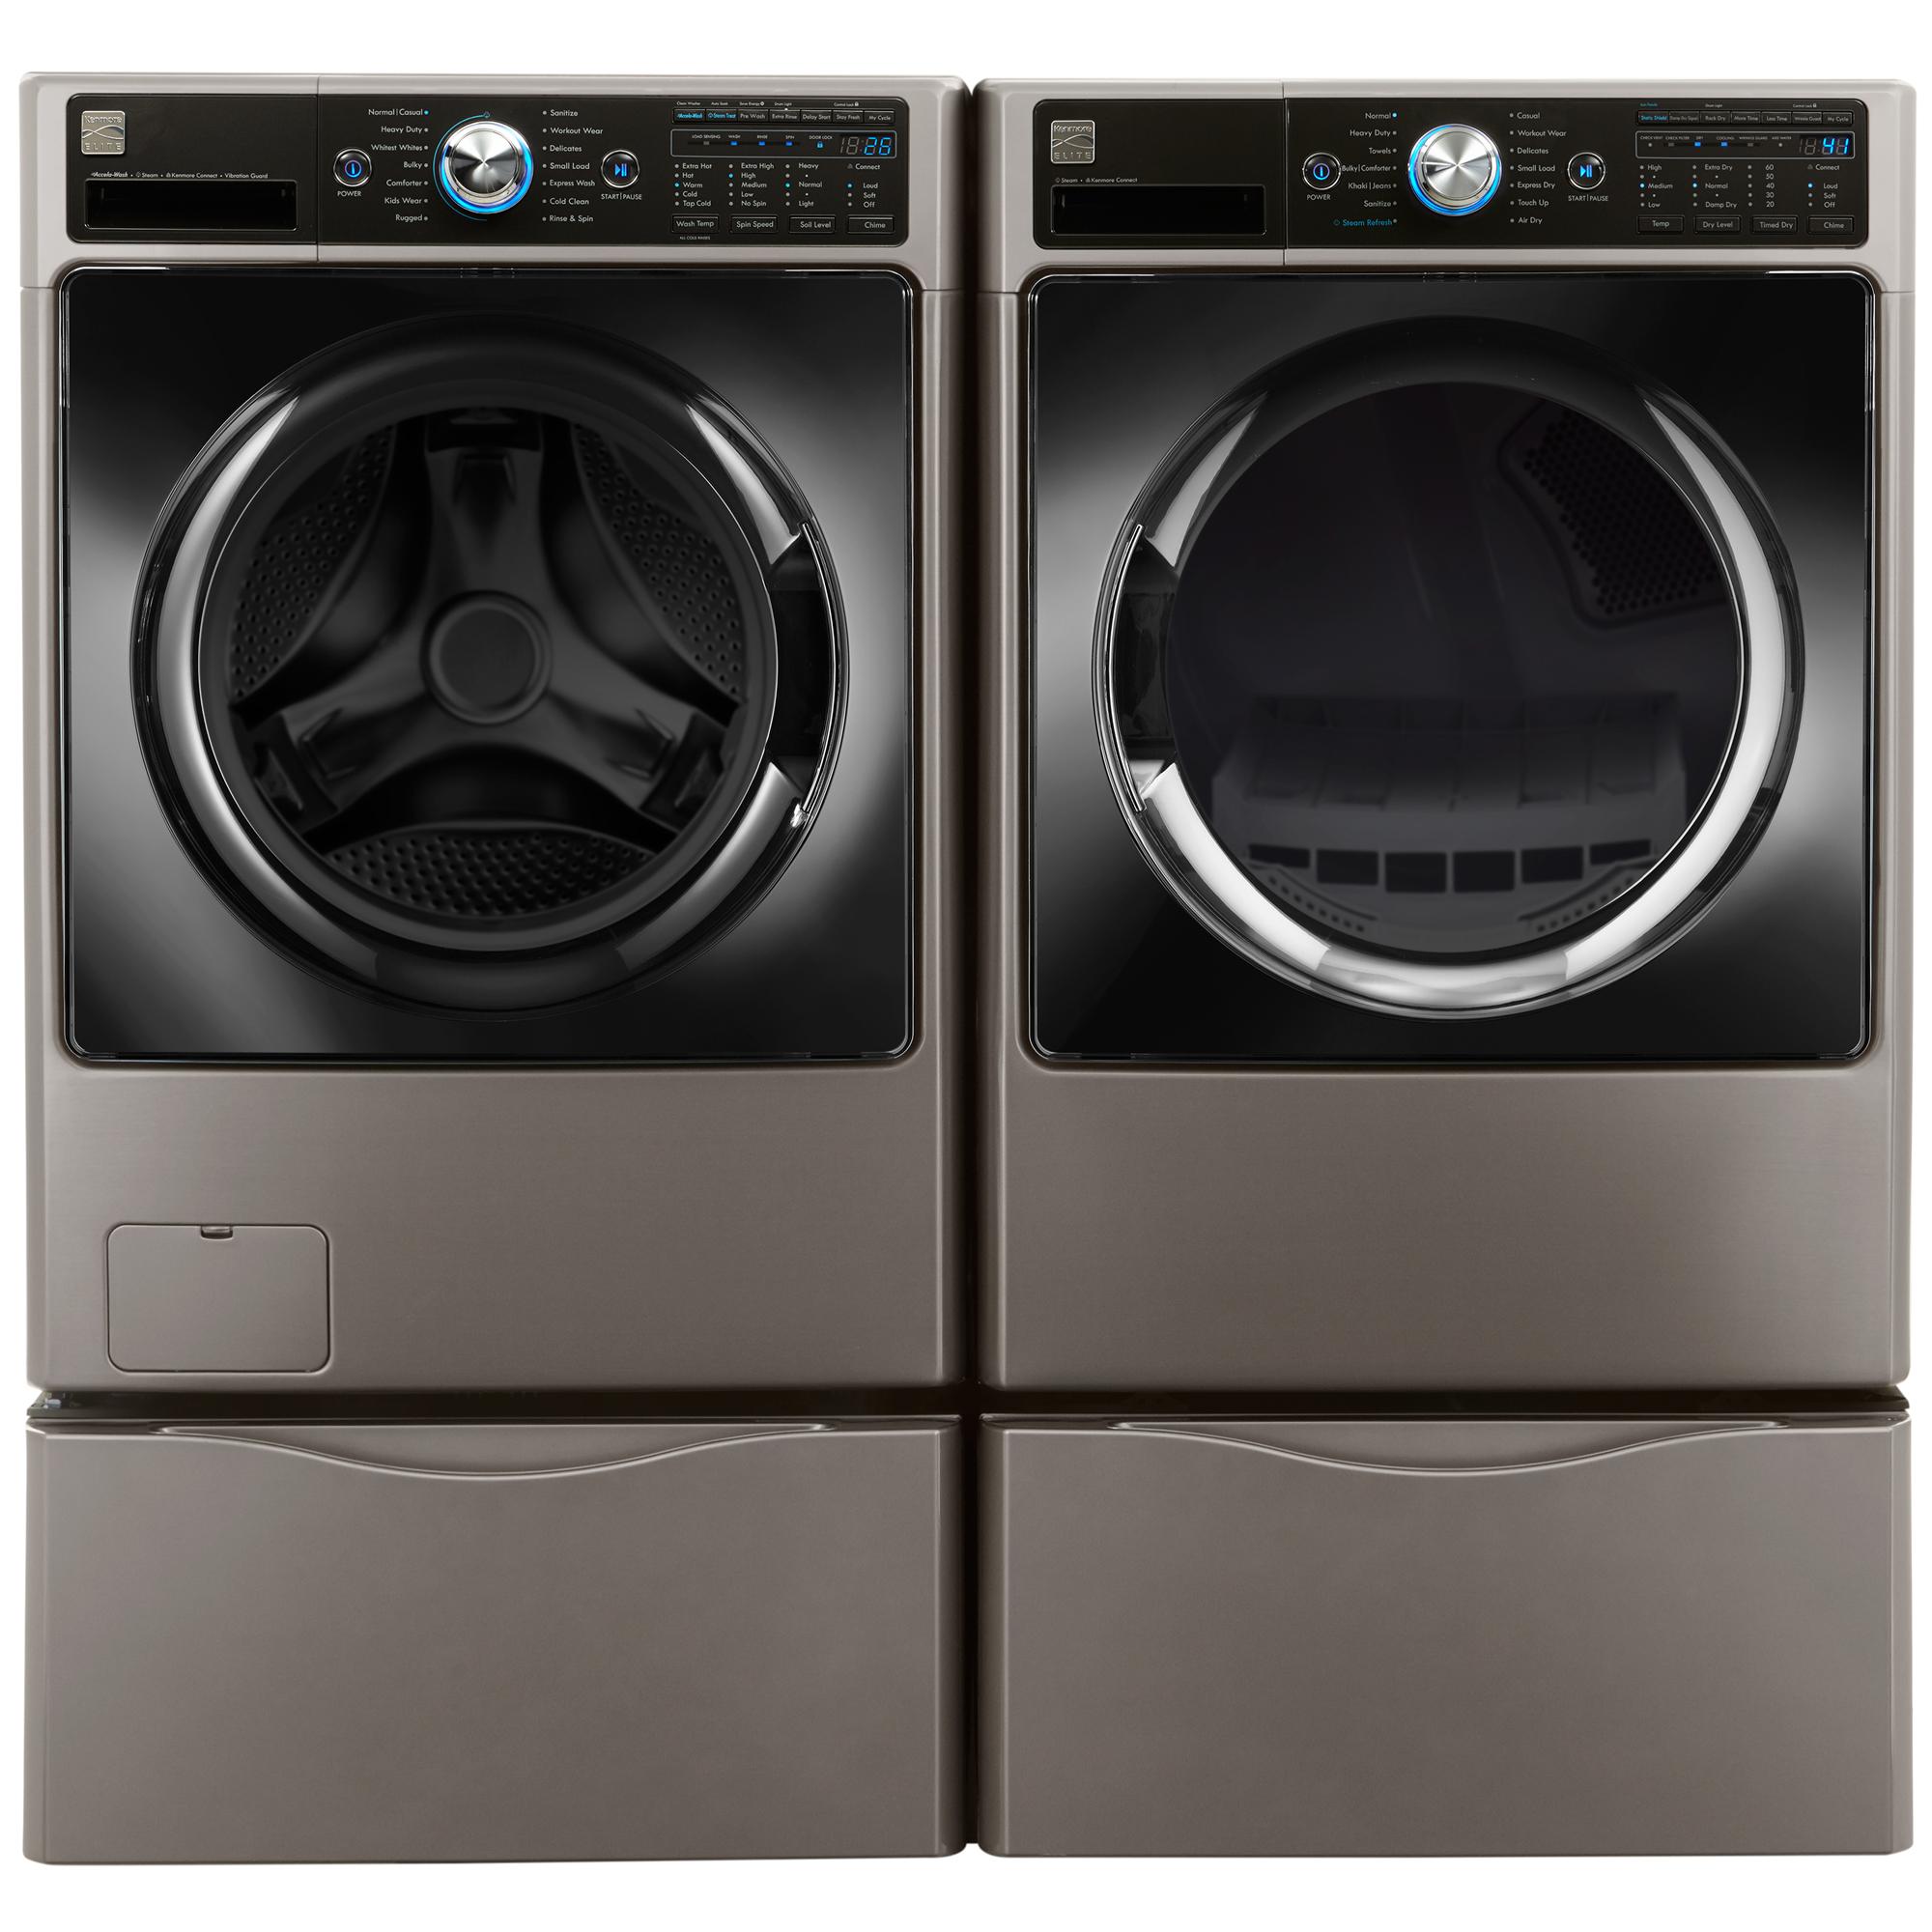 Kenmore Elite 41583 4.5 cu. ft. Front-Load Washer w/Steam & Accela Wash